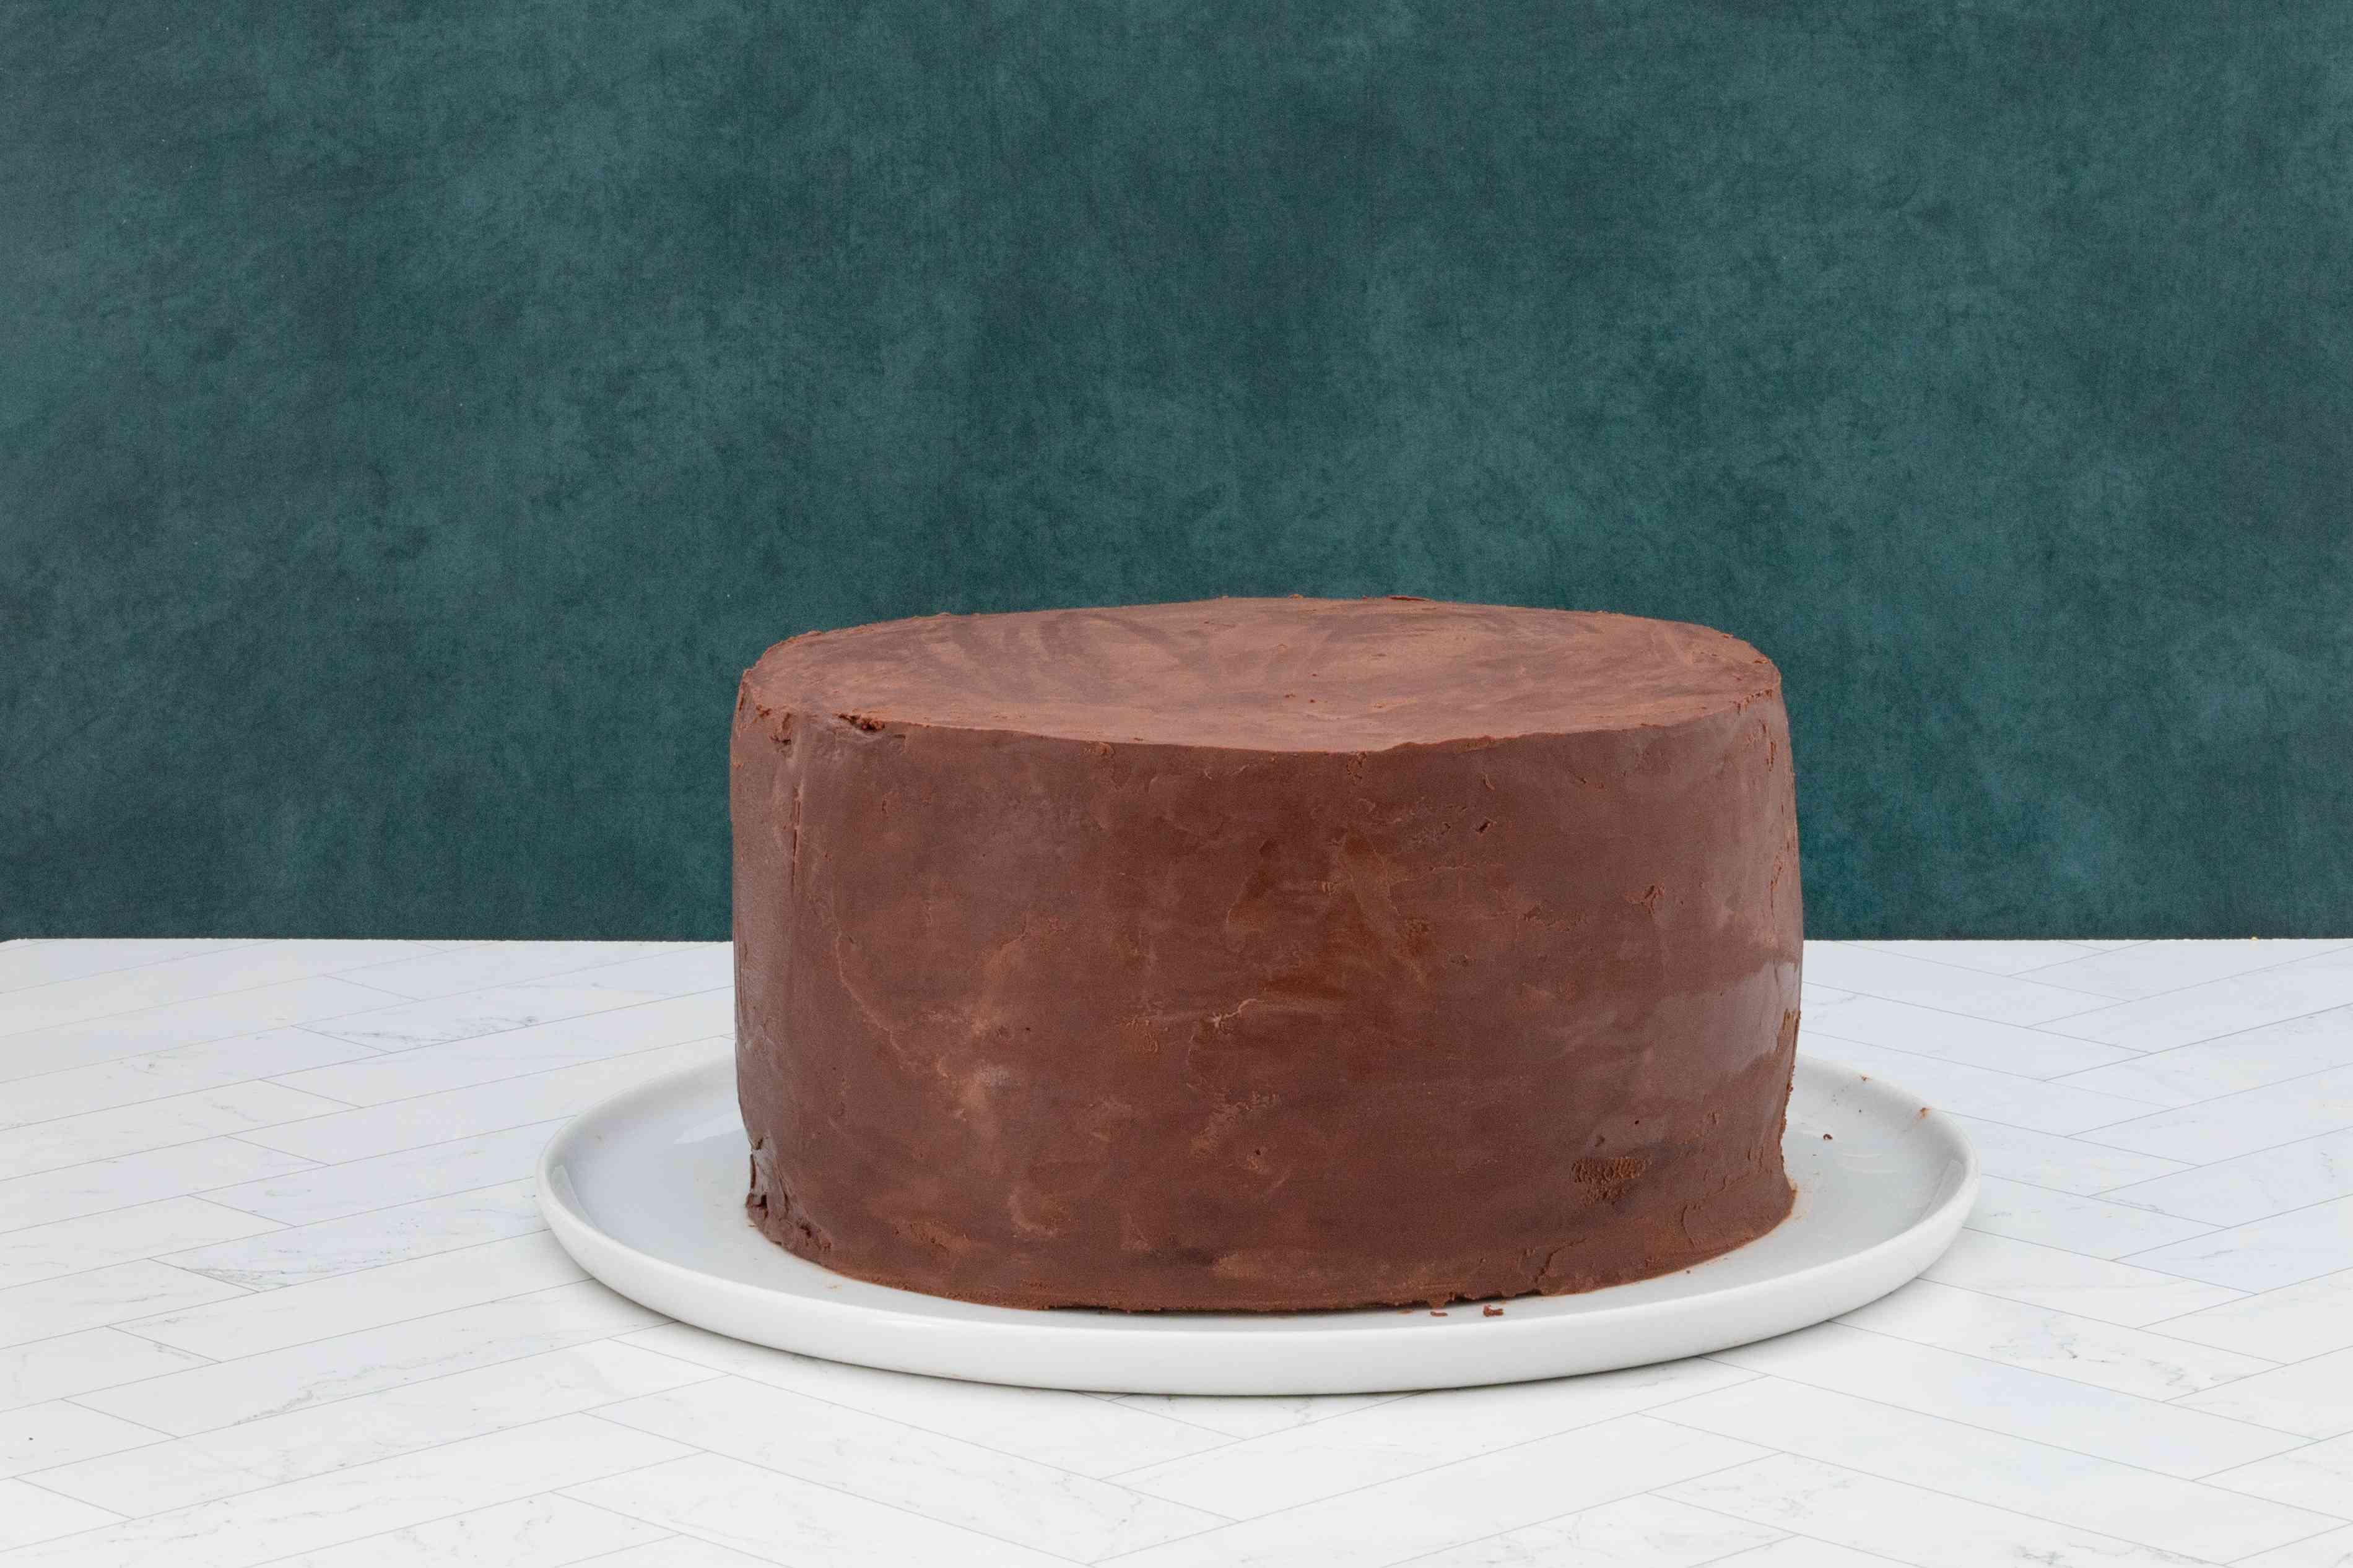 ganache-covered doberge cake